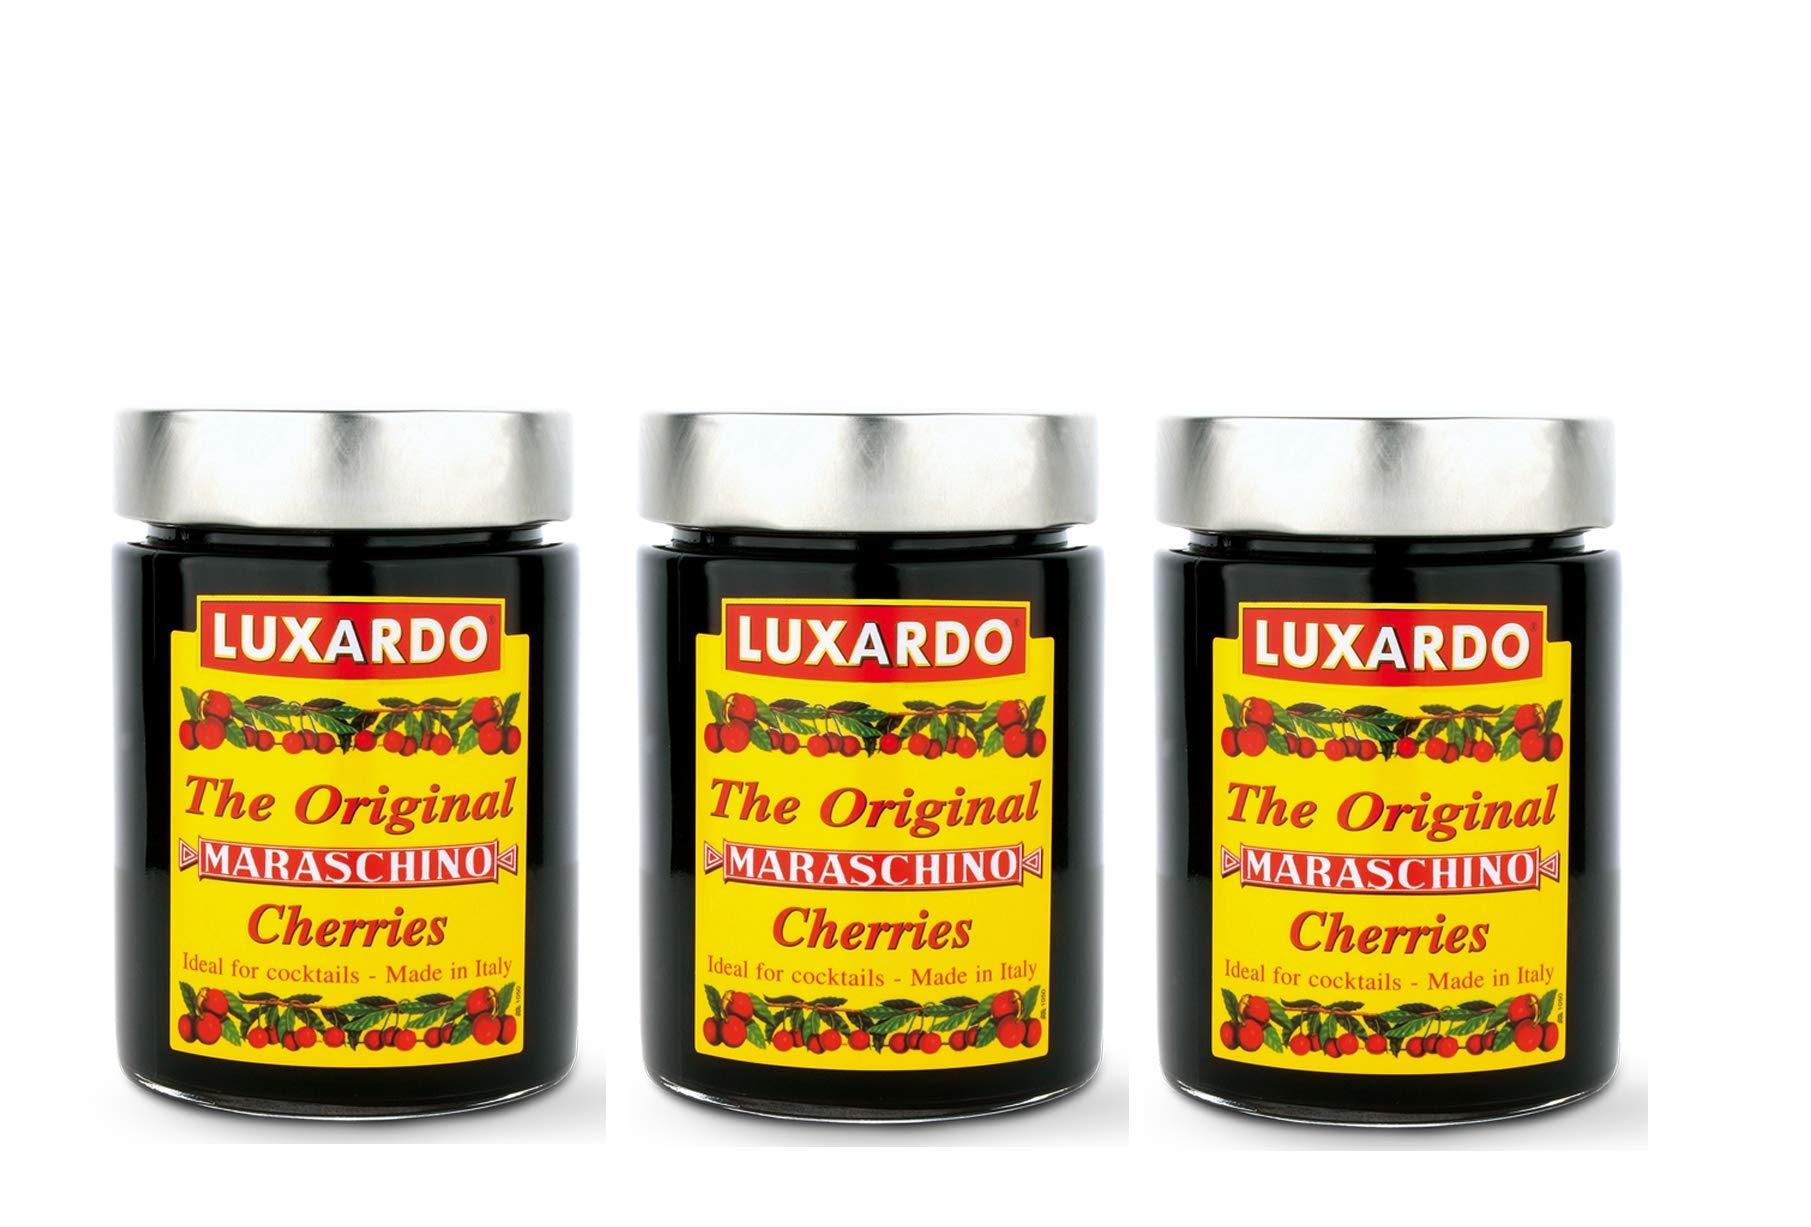 Luxardo Italian Maraschino Cherries In Syrup 400 Gram Jar (Pack of 3) by Luxardo